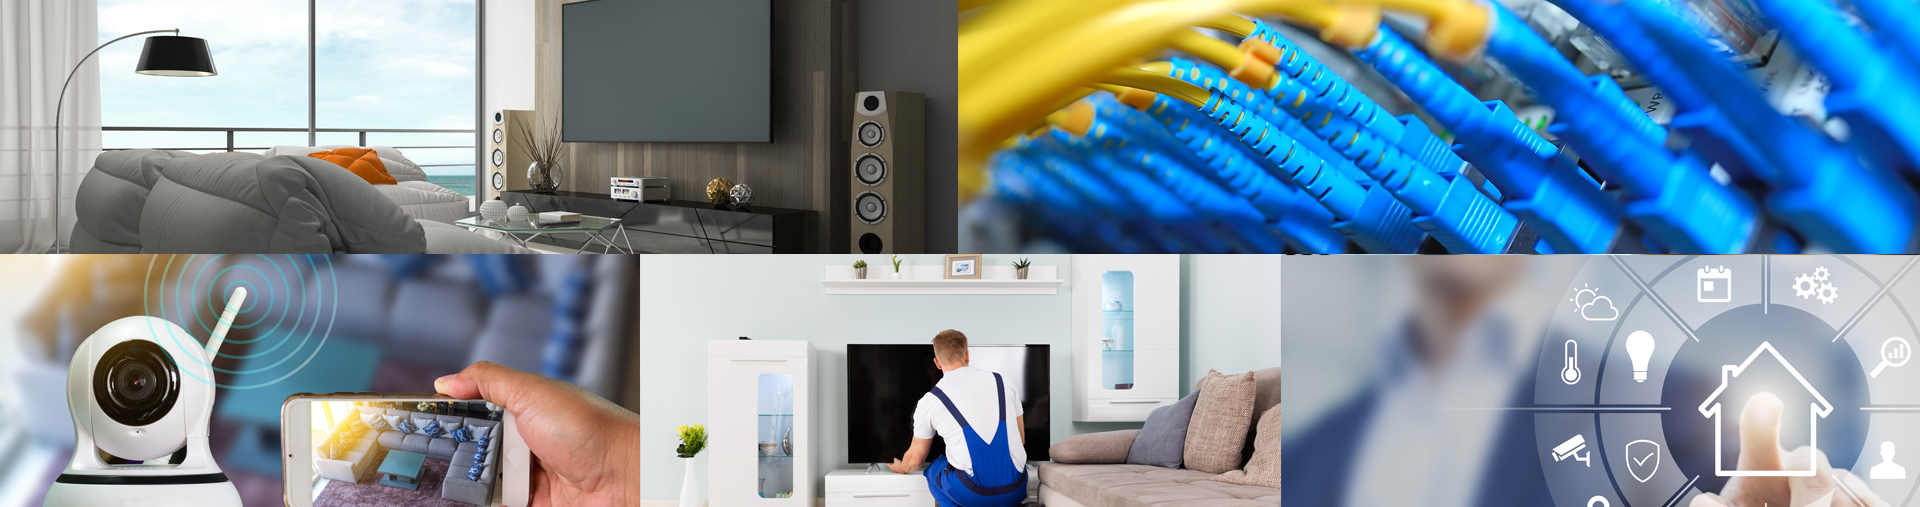 Smyrna-GA-home-Automation